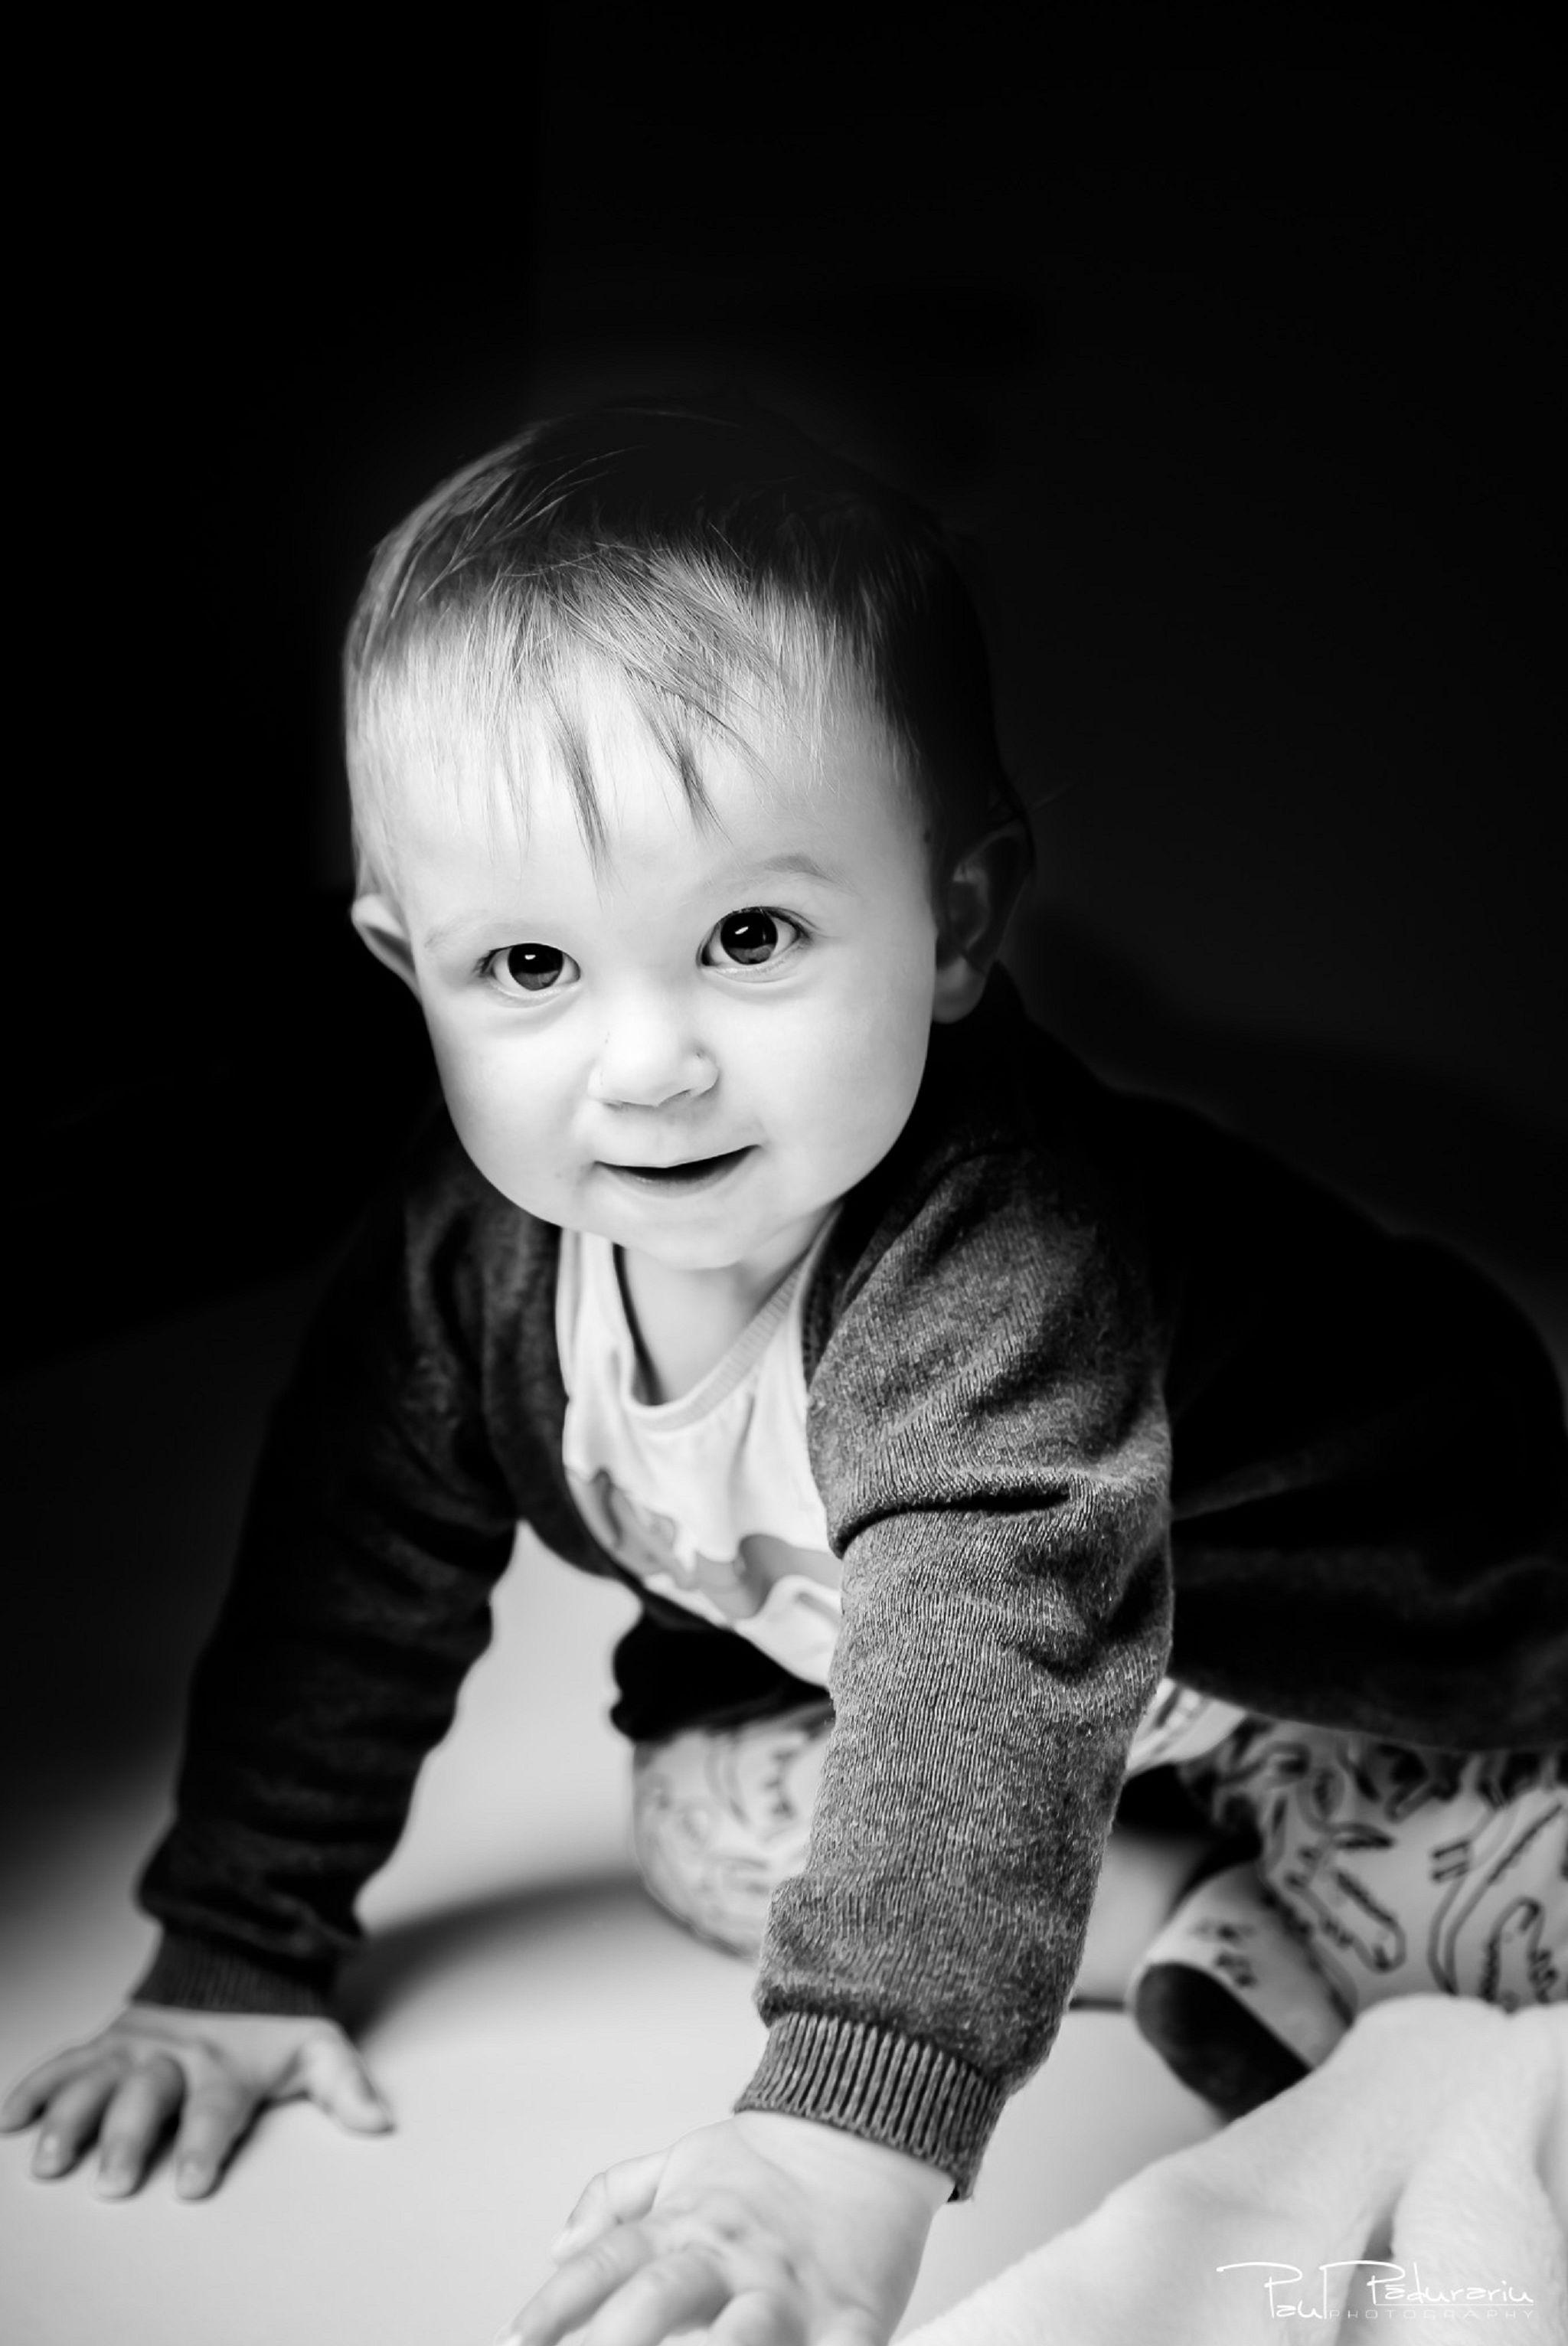 Sedinta foto pentru copii la Studio Foto Paul Padurariu Iasi - fotograf profesionist